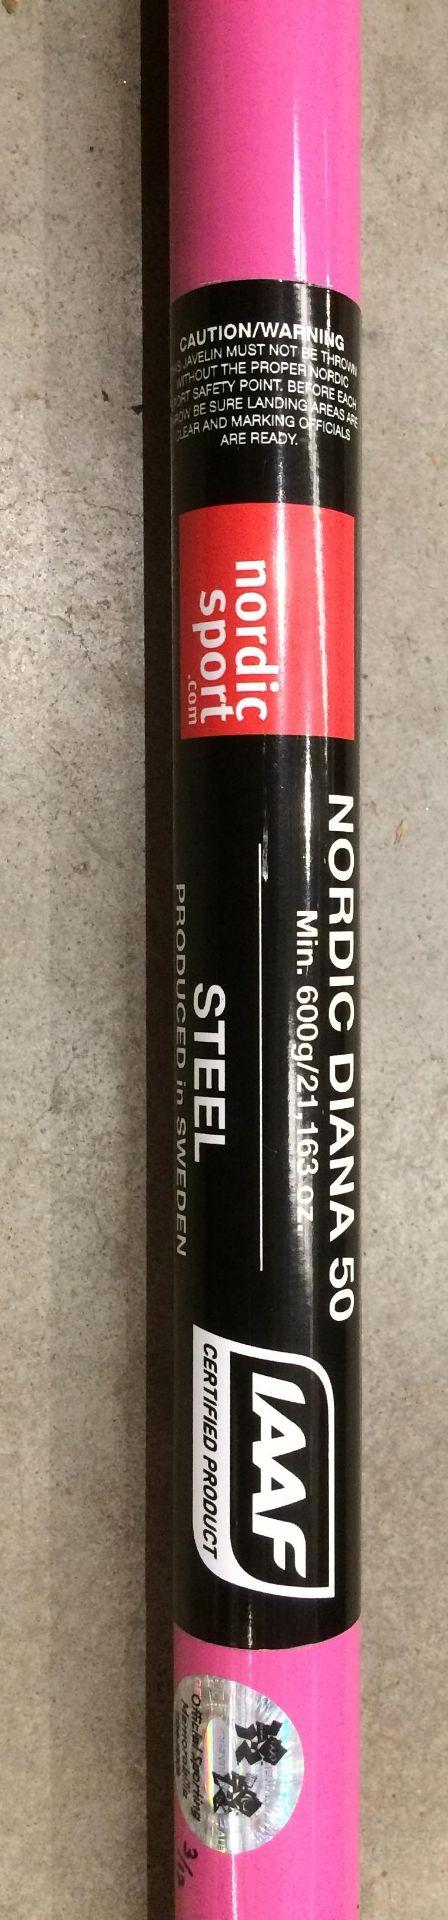 A Nordic Sport IAAF Certified Product Nordic Diana 50 steel javelin in pink (min. 600g/21.163oz). - Image 2 of 3